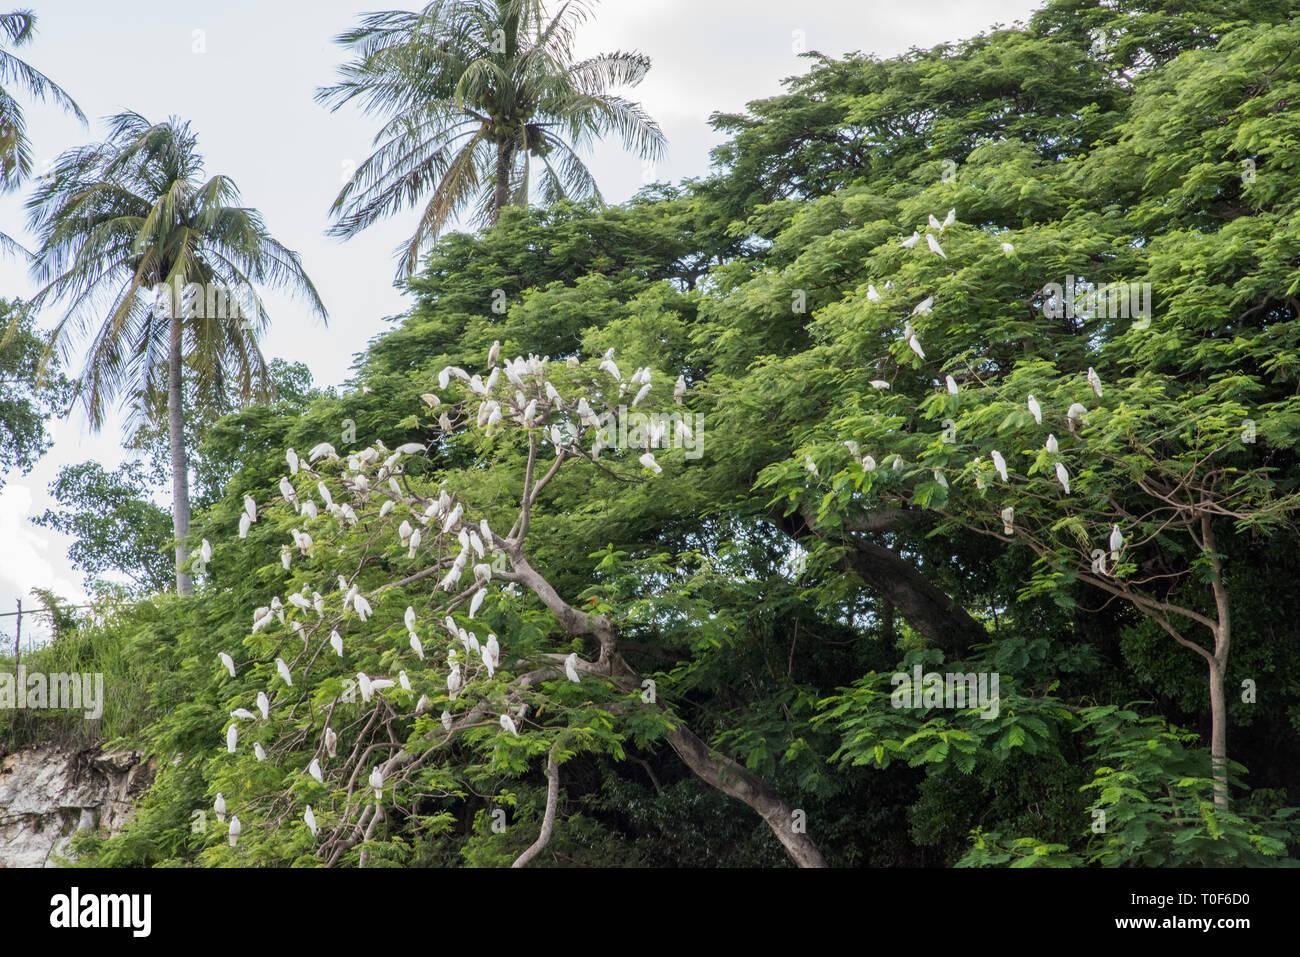 Little corella parrots perched in lush tree in tropical Darwin, Australia - Stock Image